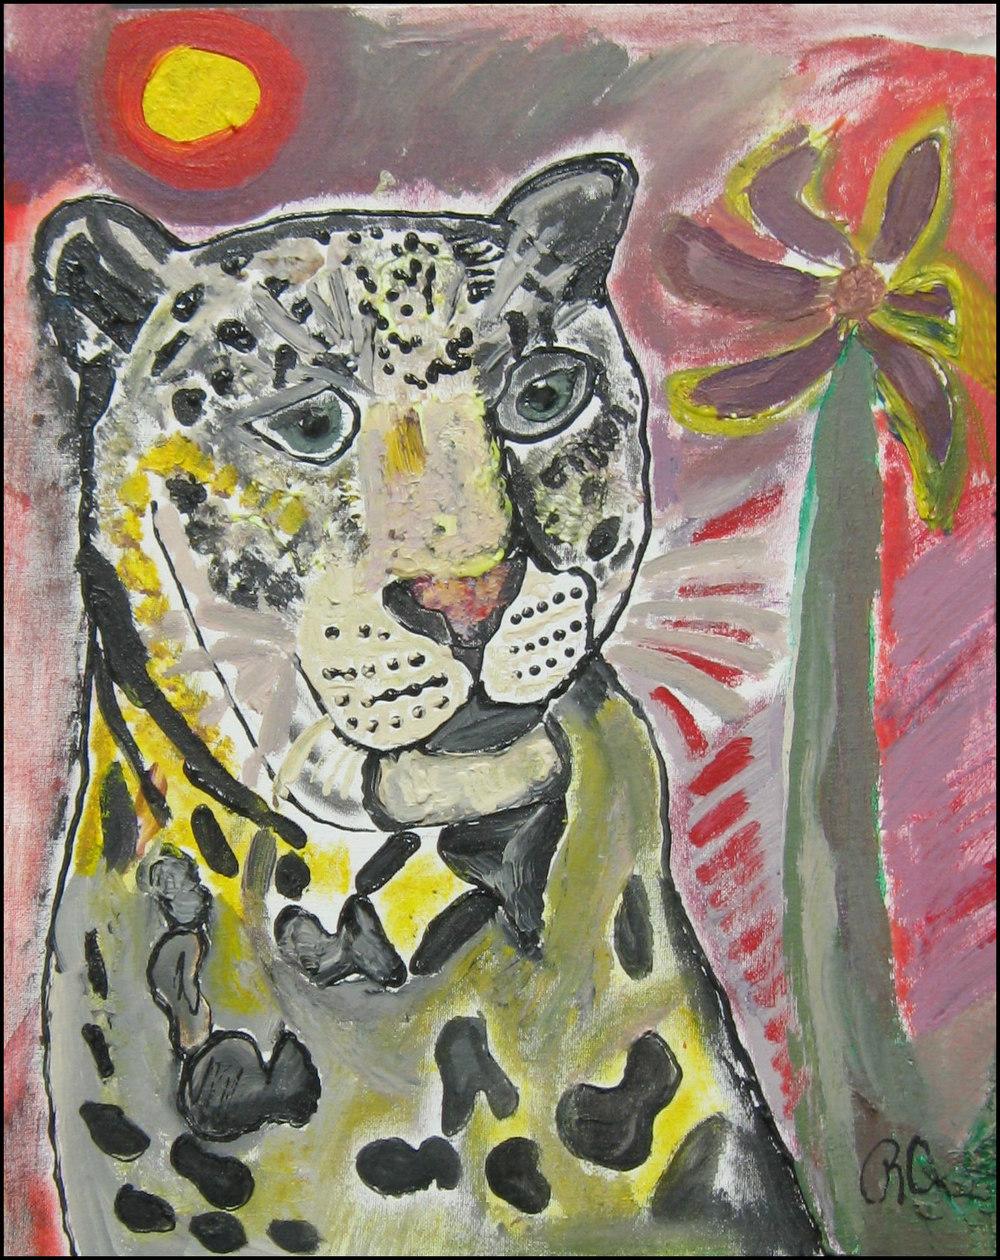 Leopard Rachael Alhassan 2014 Acrylic on Canvas, 18x14 NFS, print $40